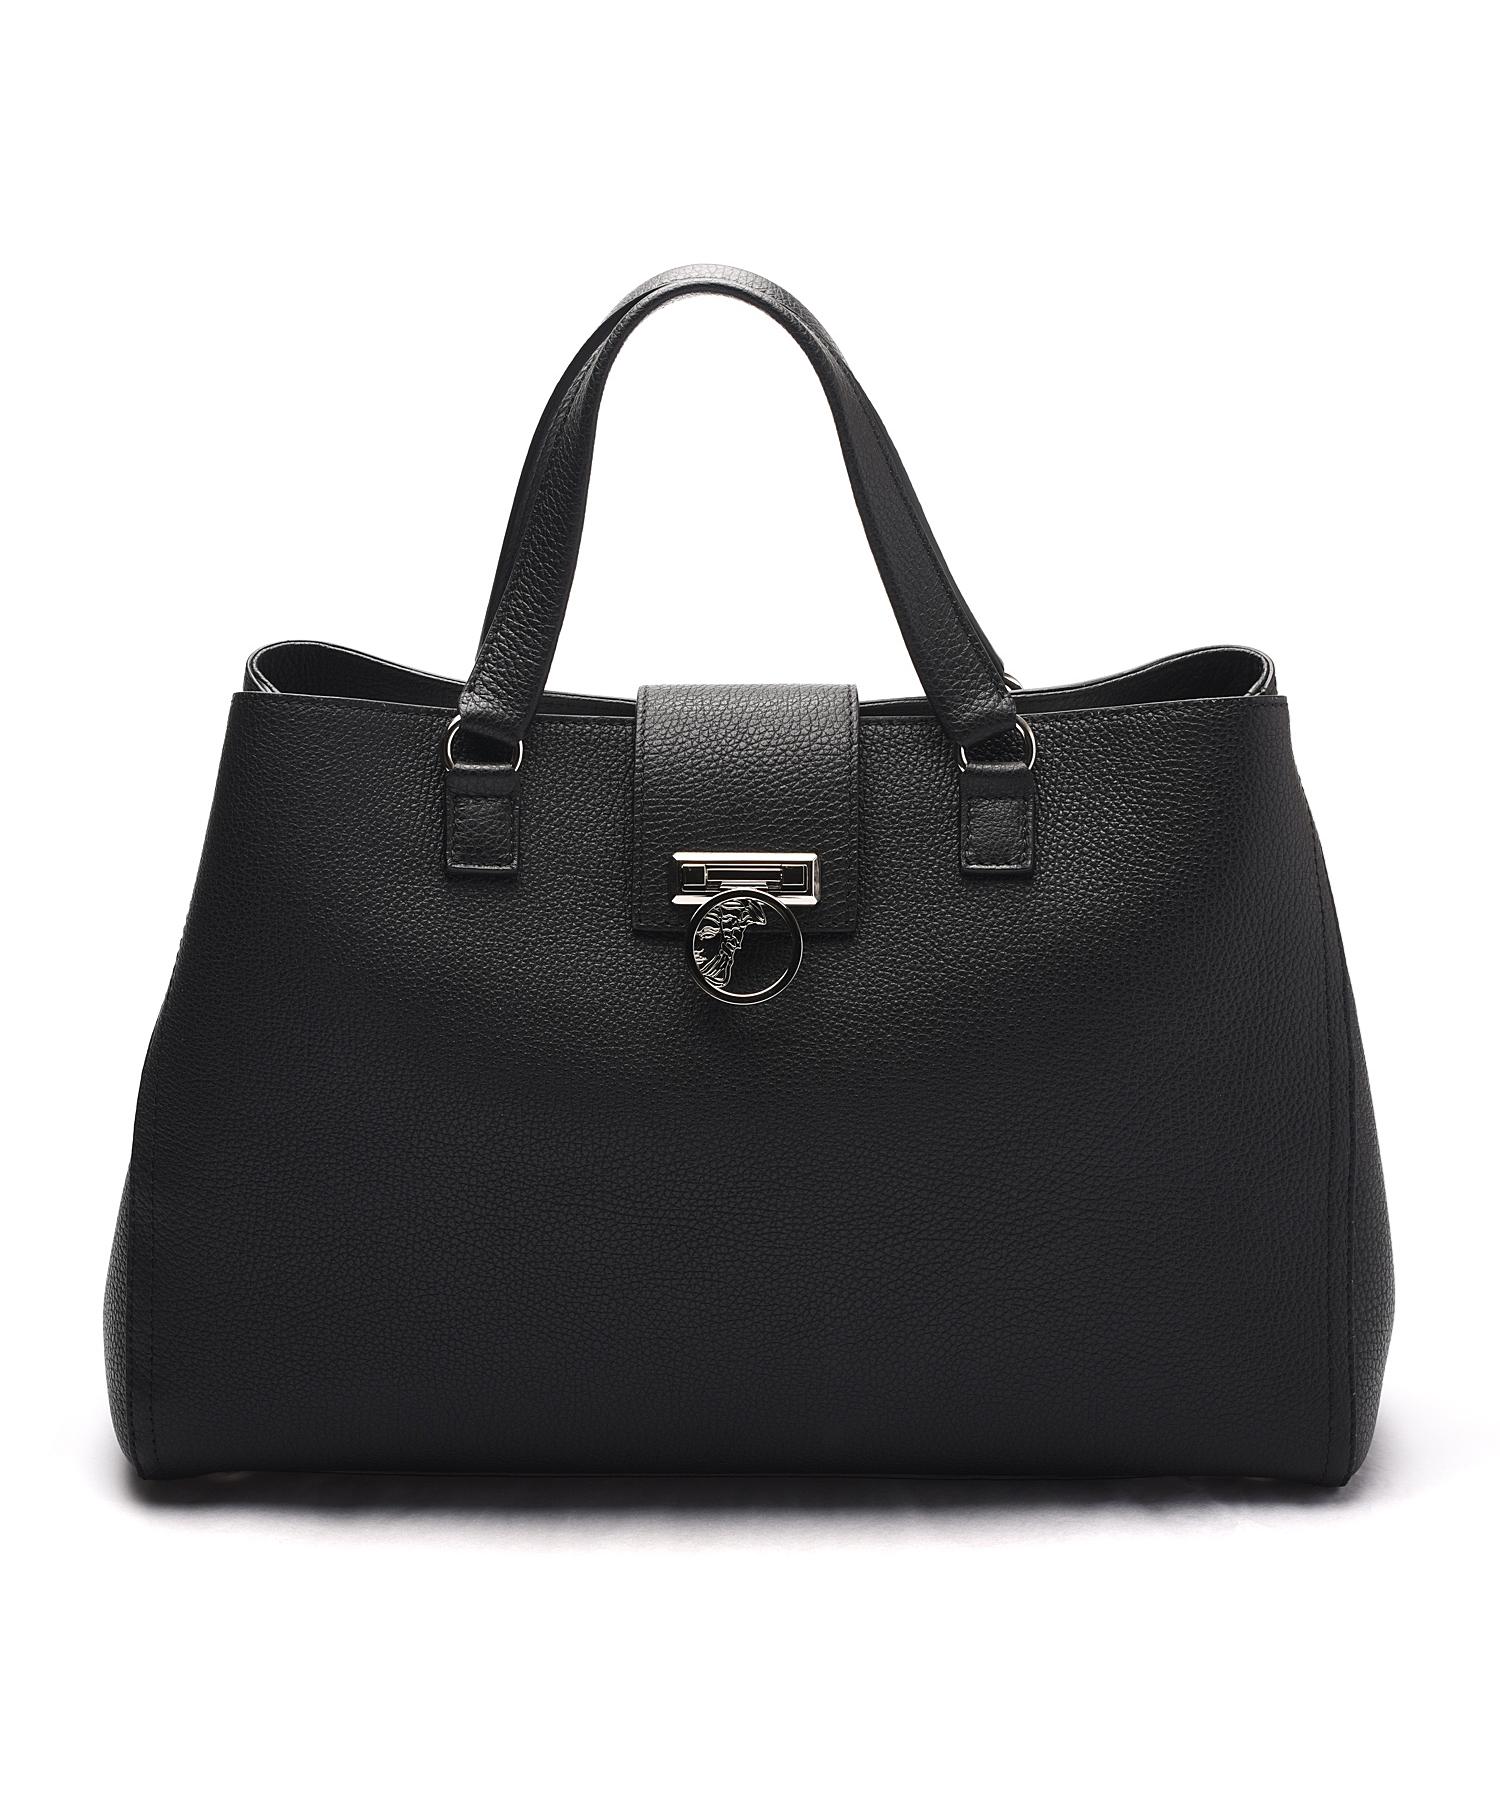 Versace Pebbled Leather Satchel Handbag In Black Lyst